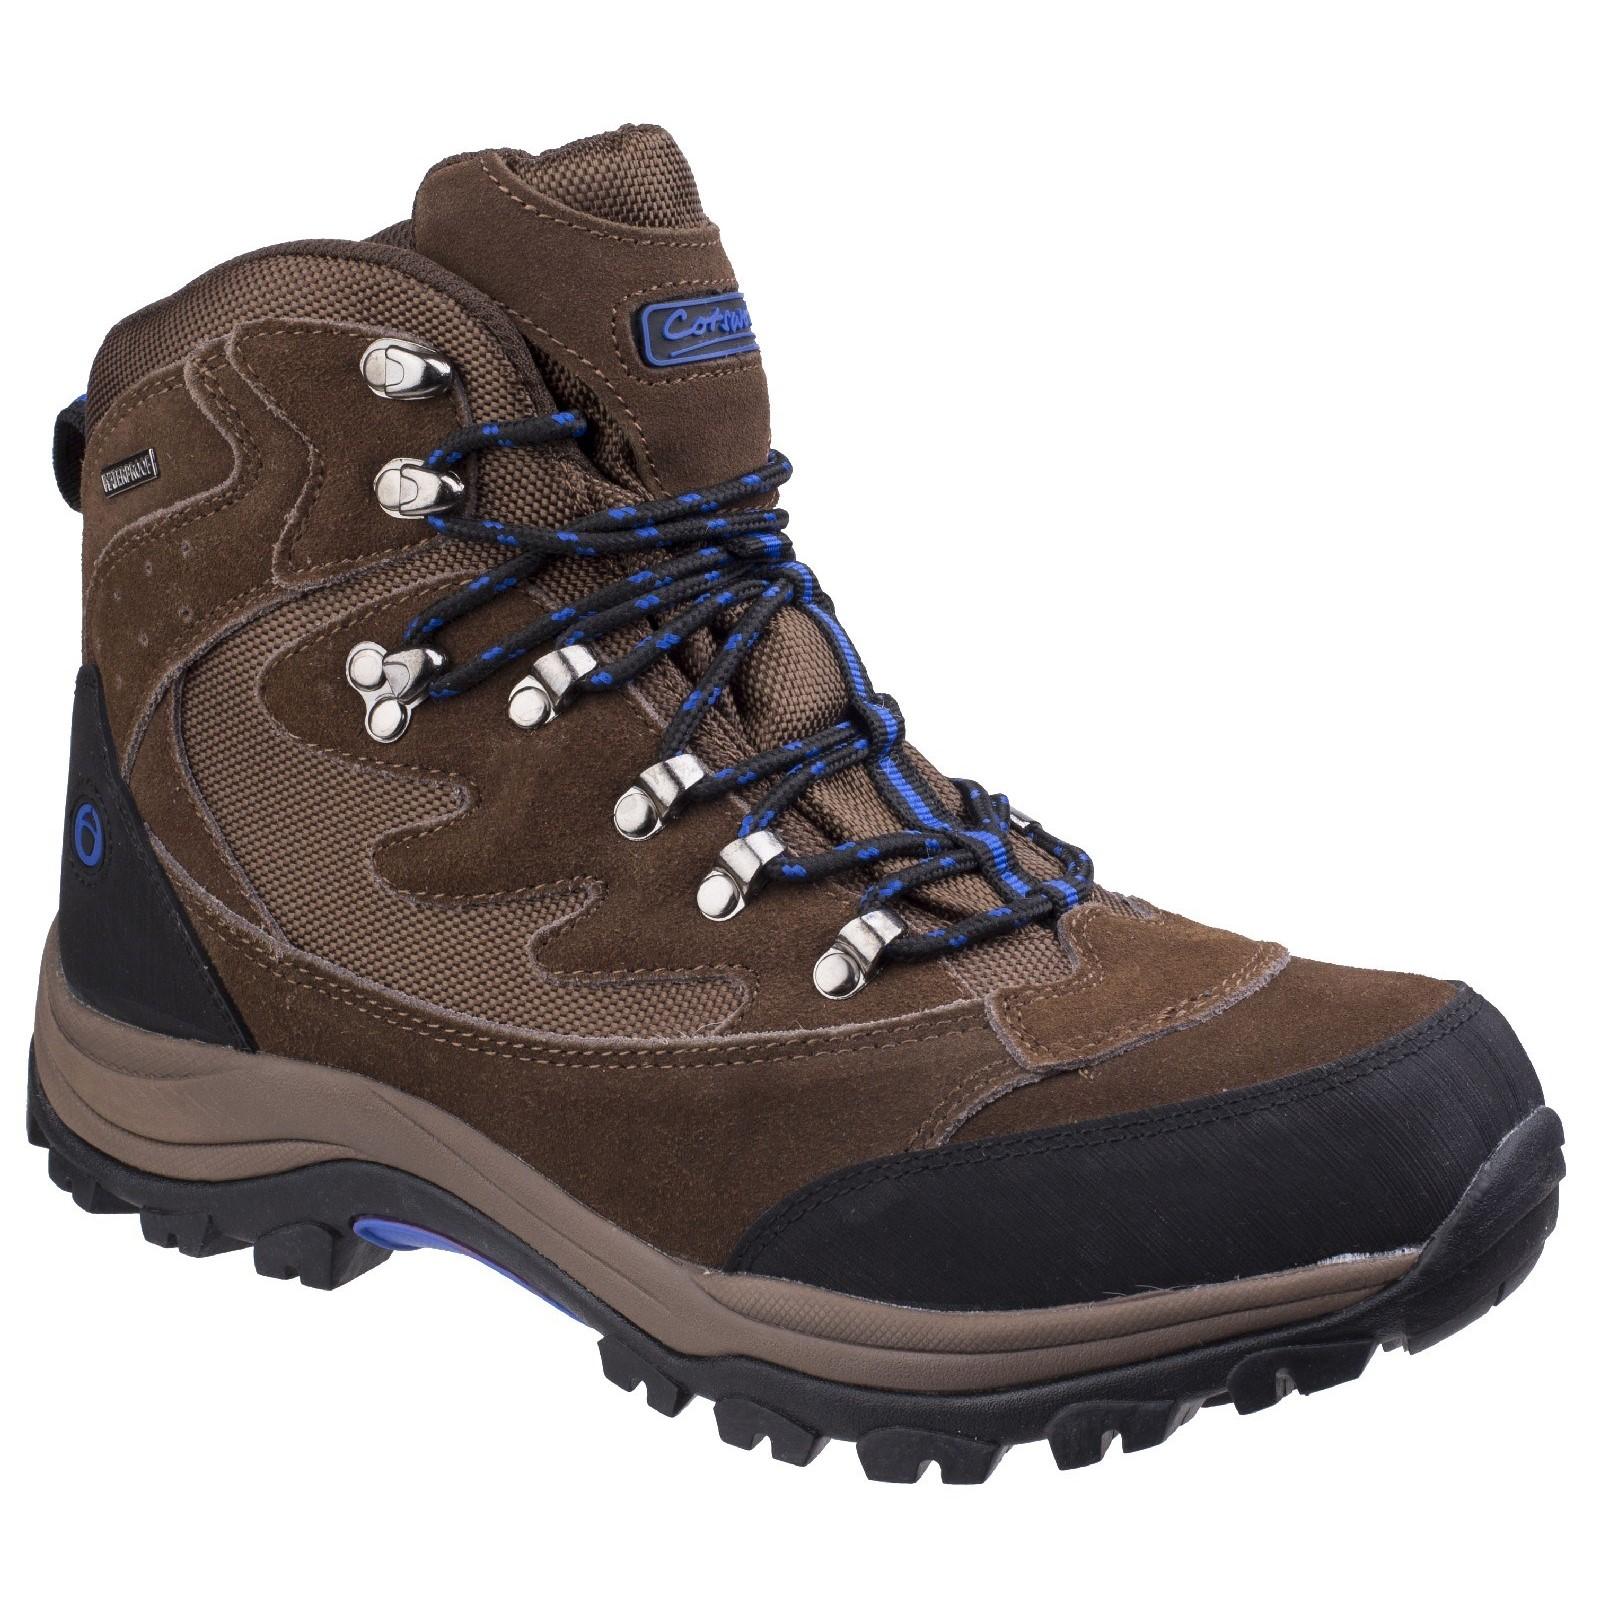 Cotswold Oxerton Brown - Chaussures Chaussures-de-randonnee Homme